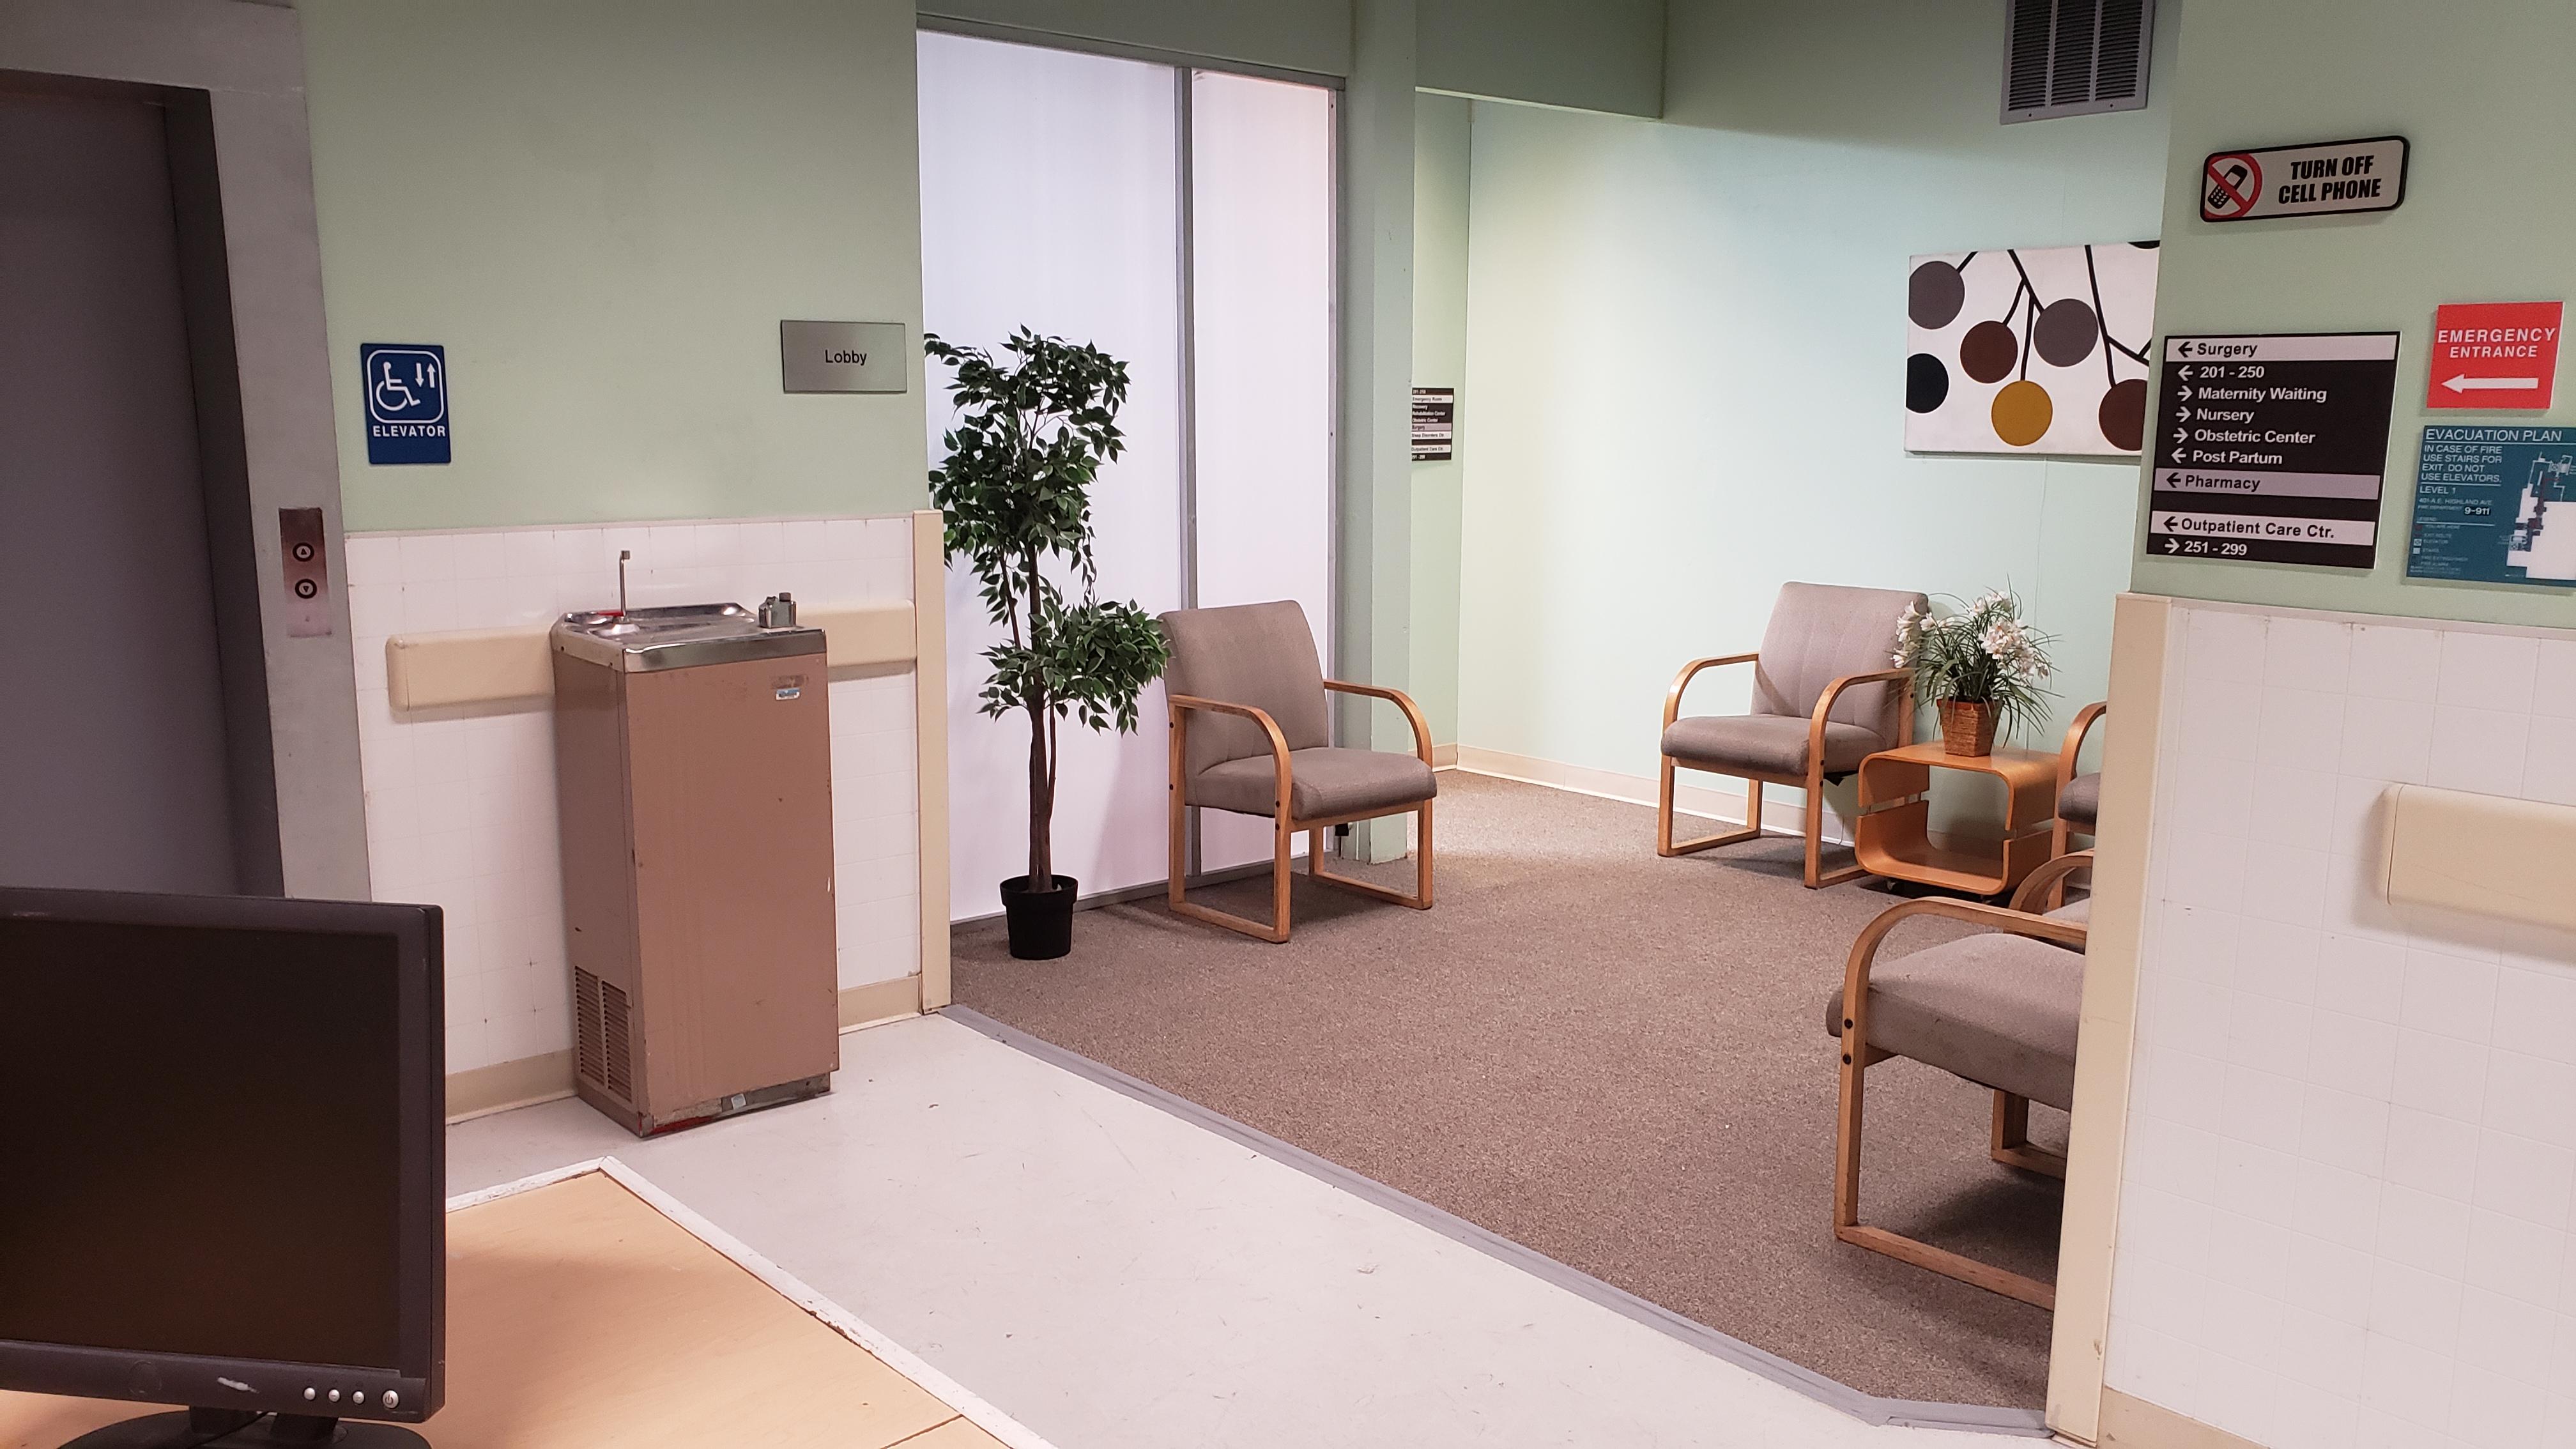 Updated Lobby/Waiting Room 2/16/20